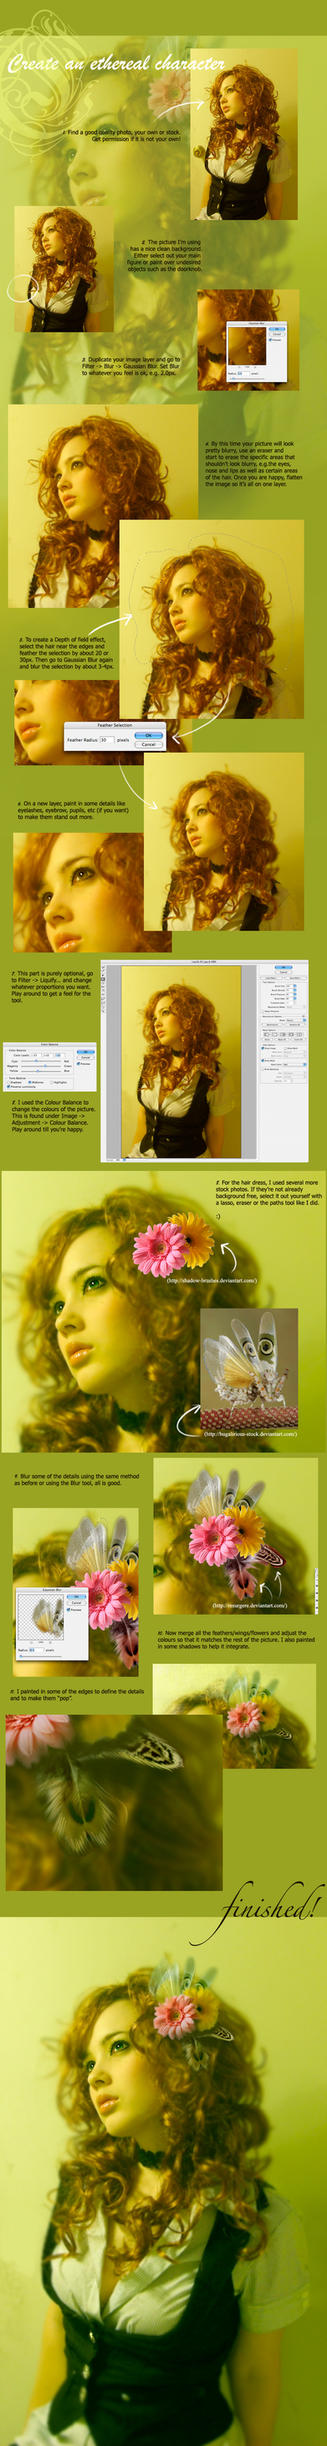 Photomanipulation Tutorial by acidlullaby